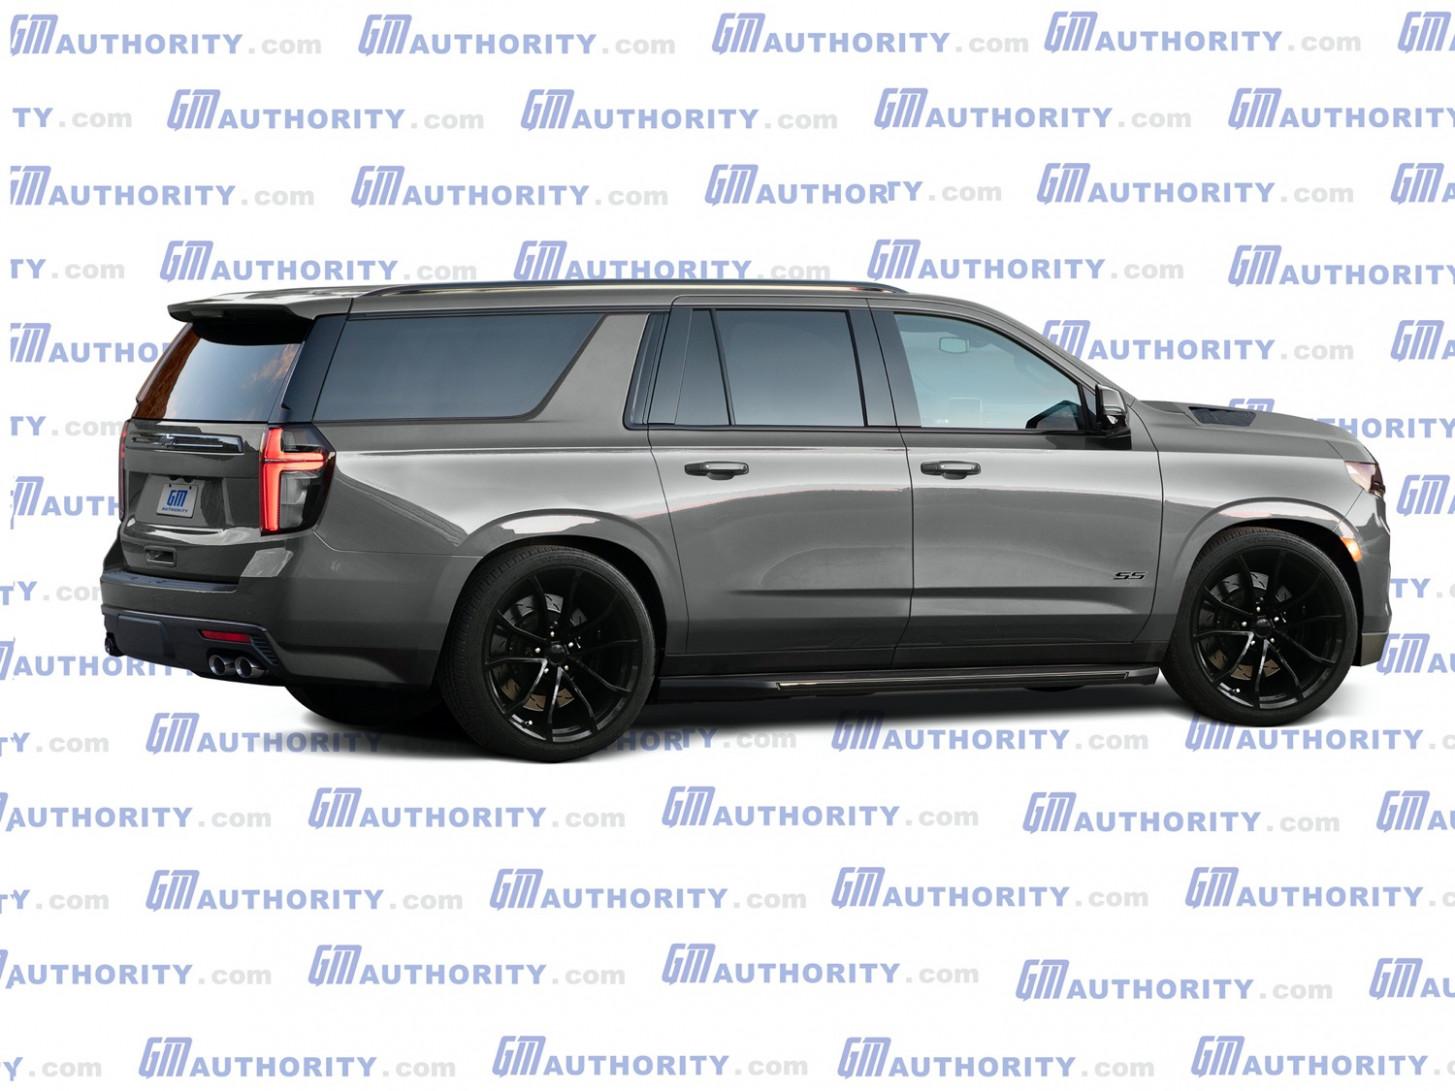 Rumors 2022 Chevrolet Suburban